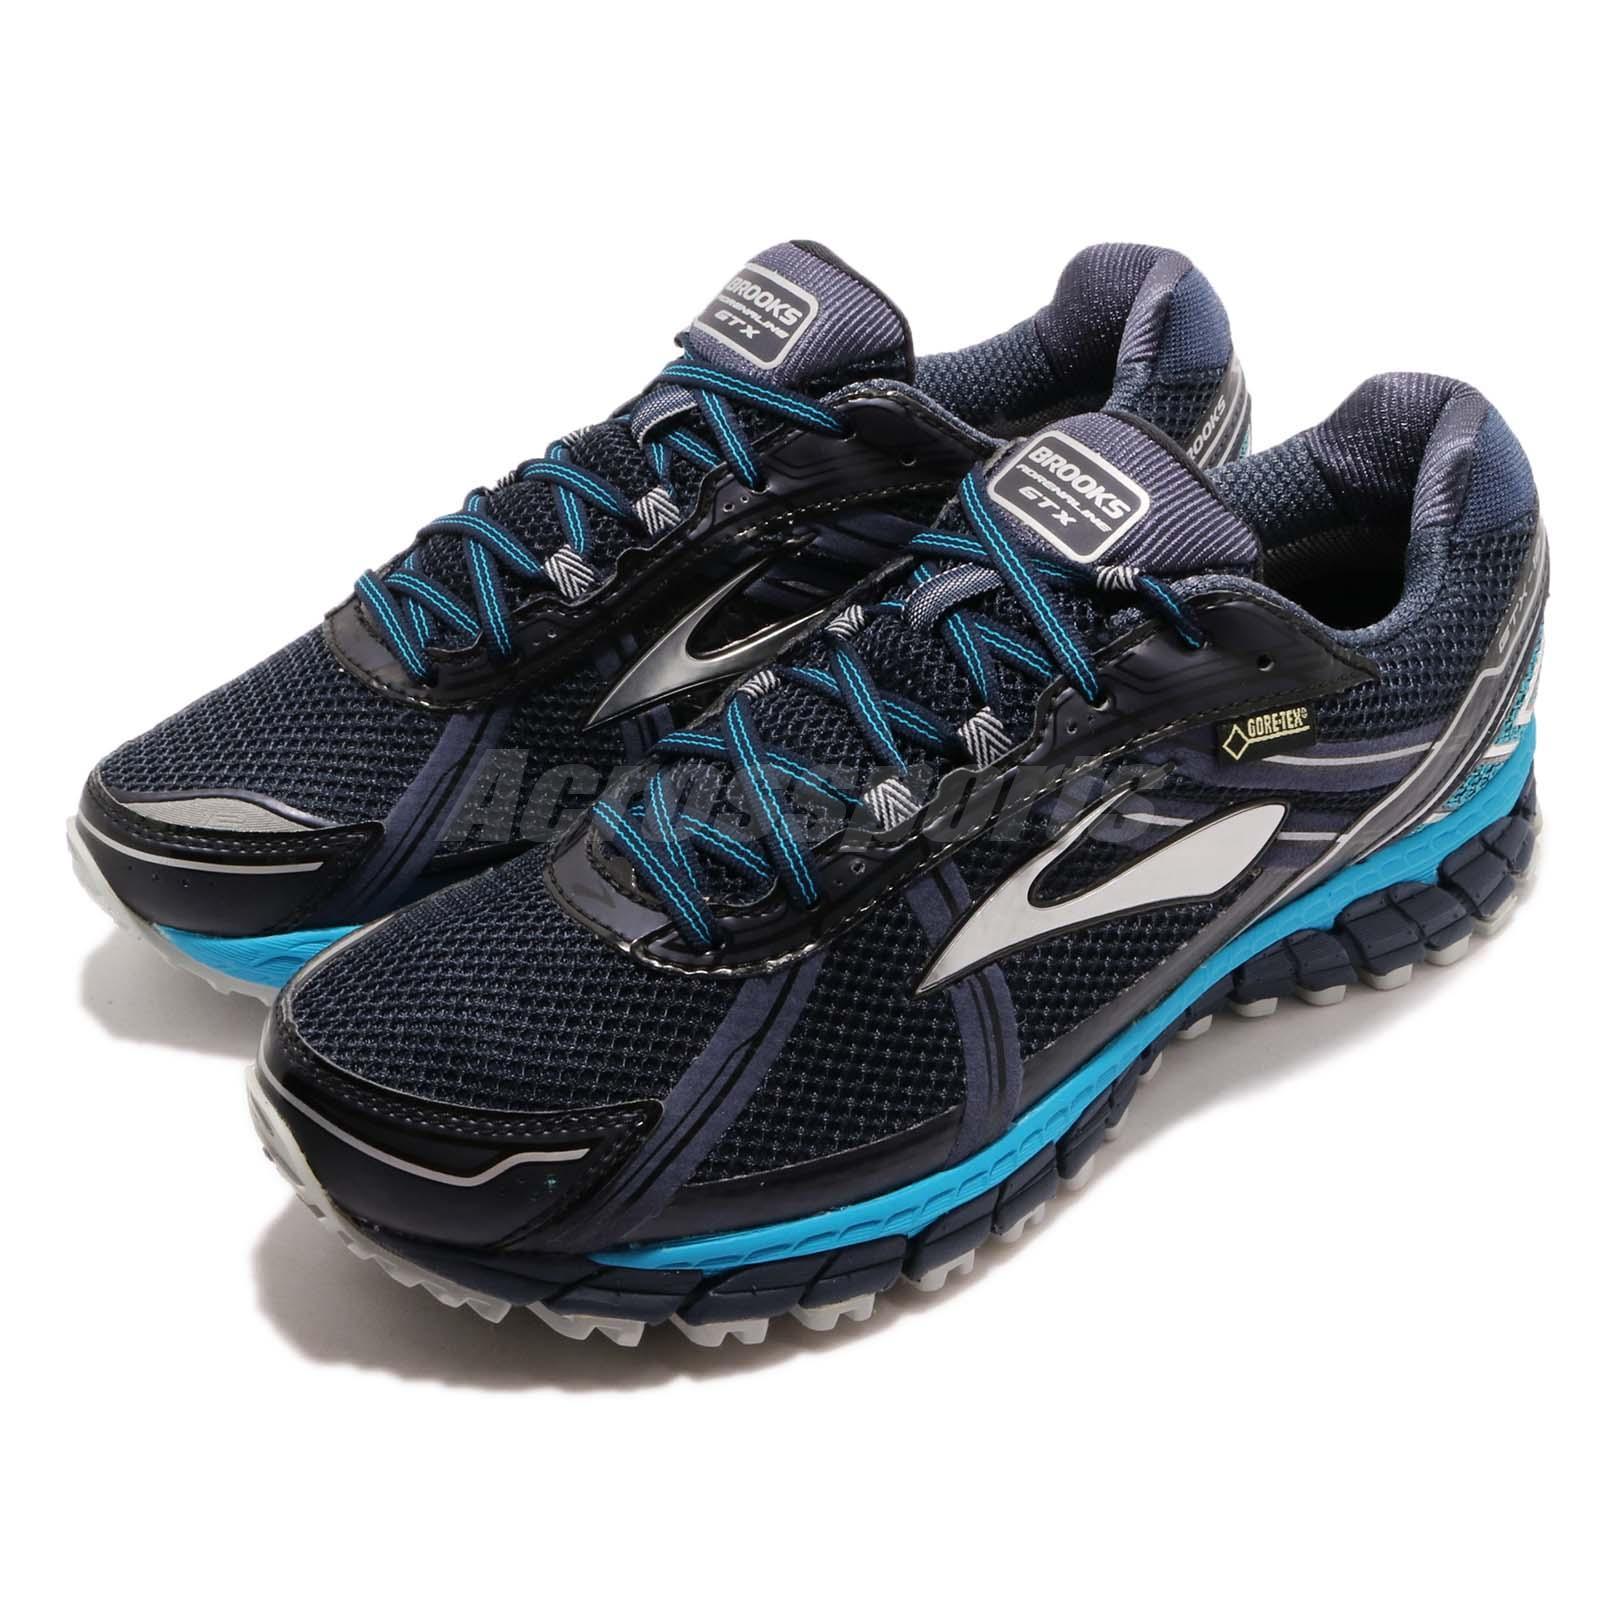 9b45bfda6e7e6 Details about Brooks Adrenaline ASR 12 GTX Gore-Tex Peacoat Blue Men  Running Shoes 110203 1D